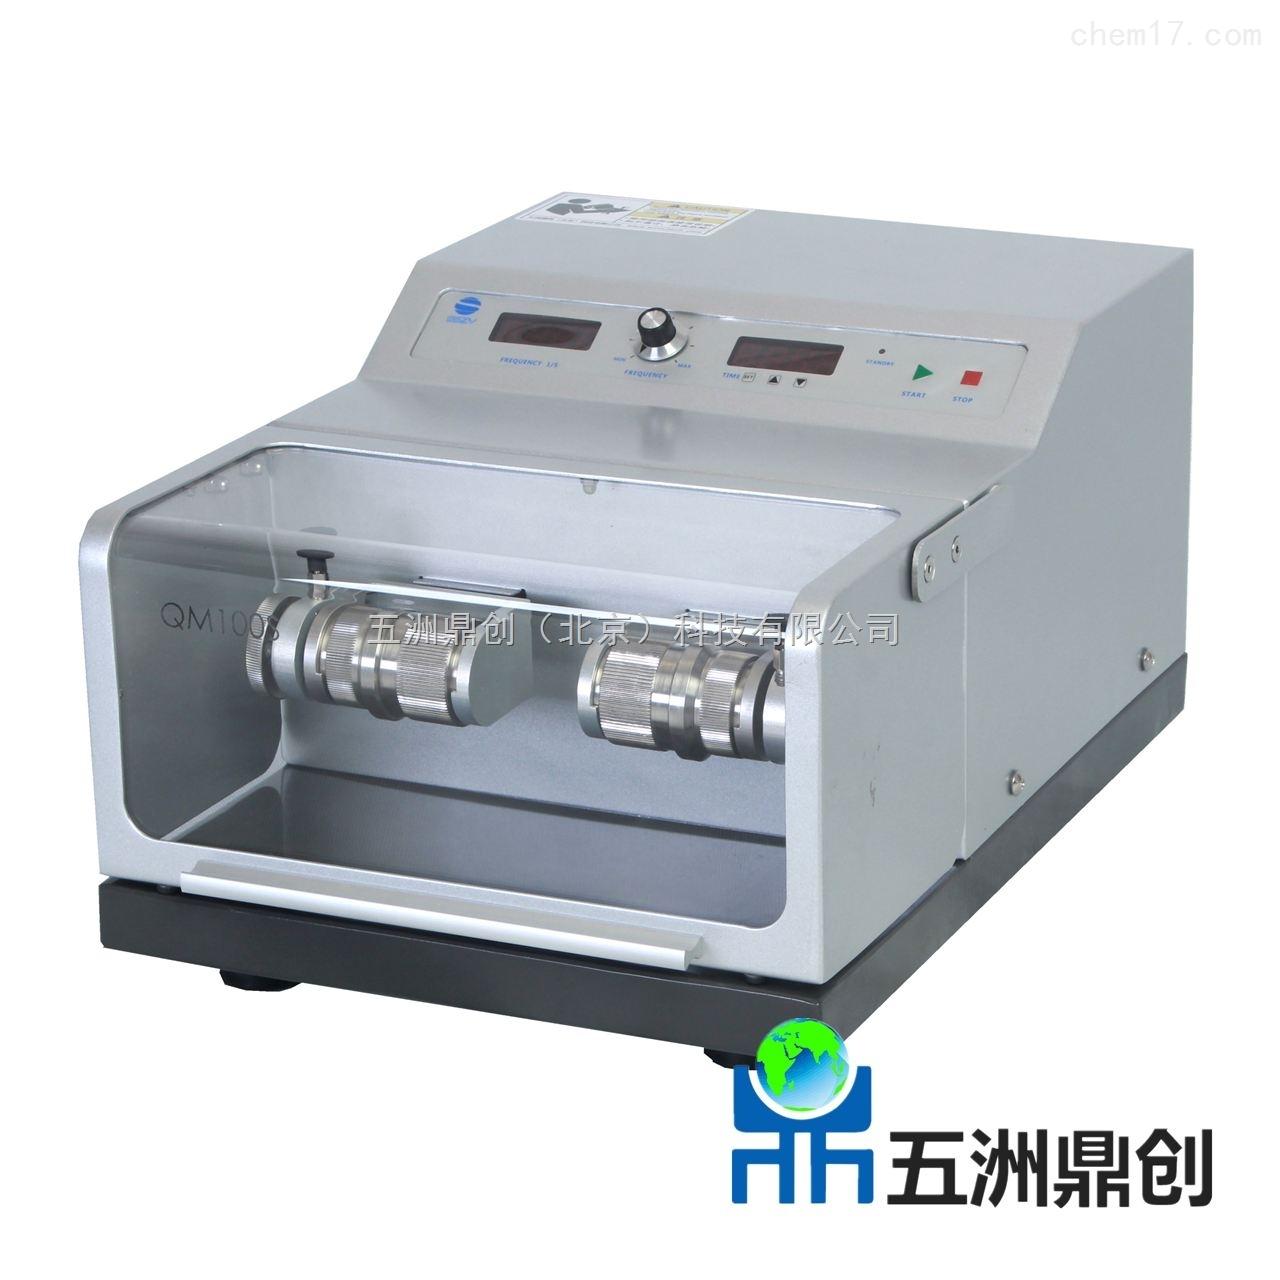 QM100长春 高通量组织研磨仪 冷冻研磨仪 实验室粉粹机